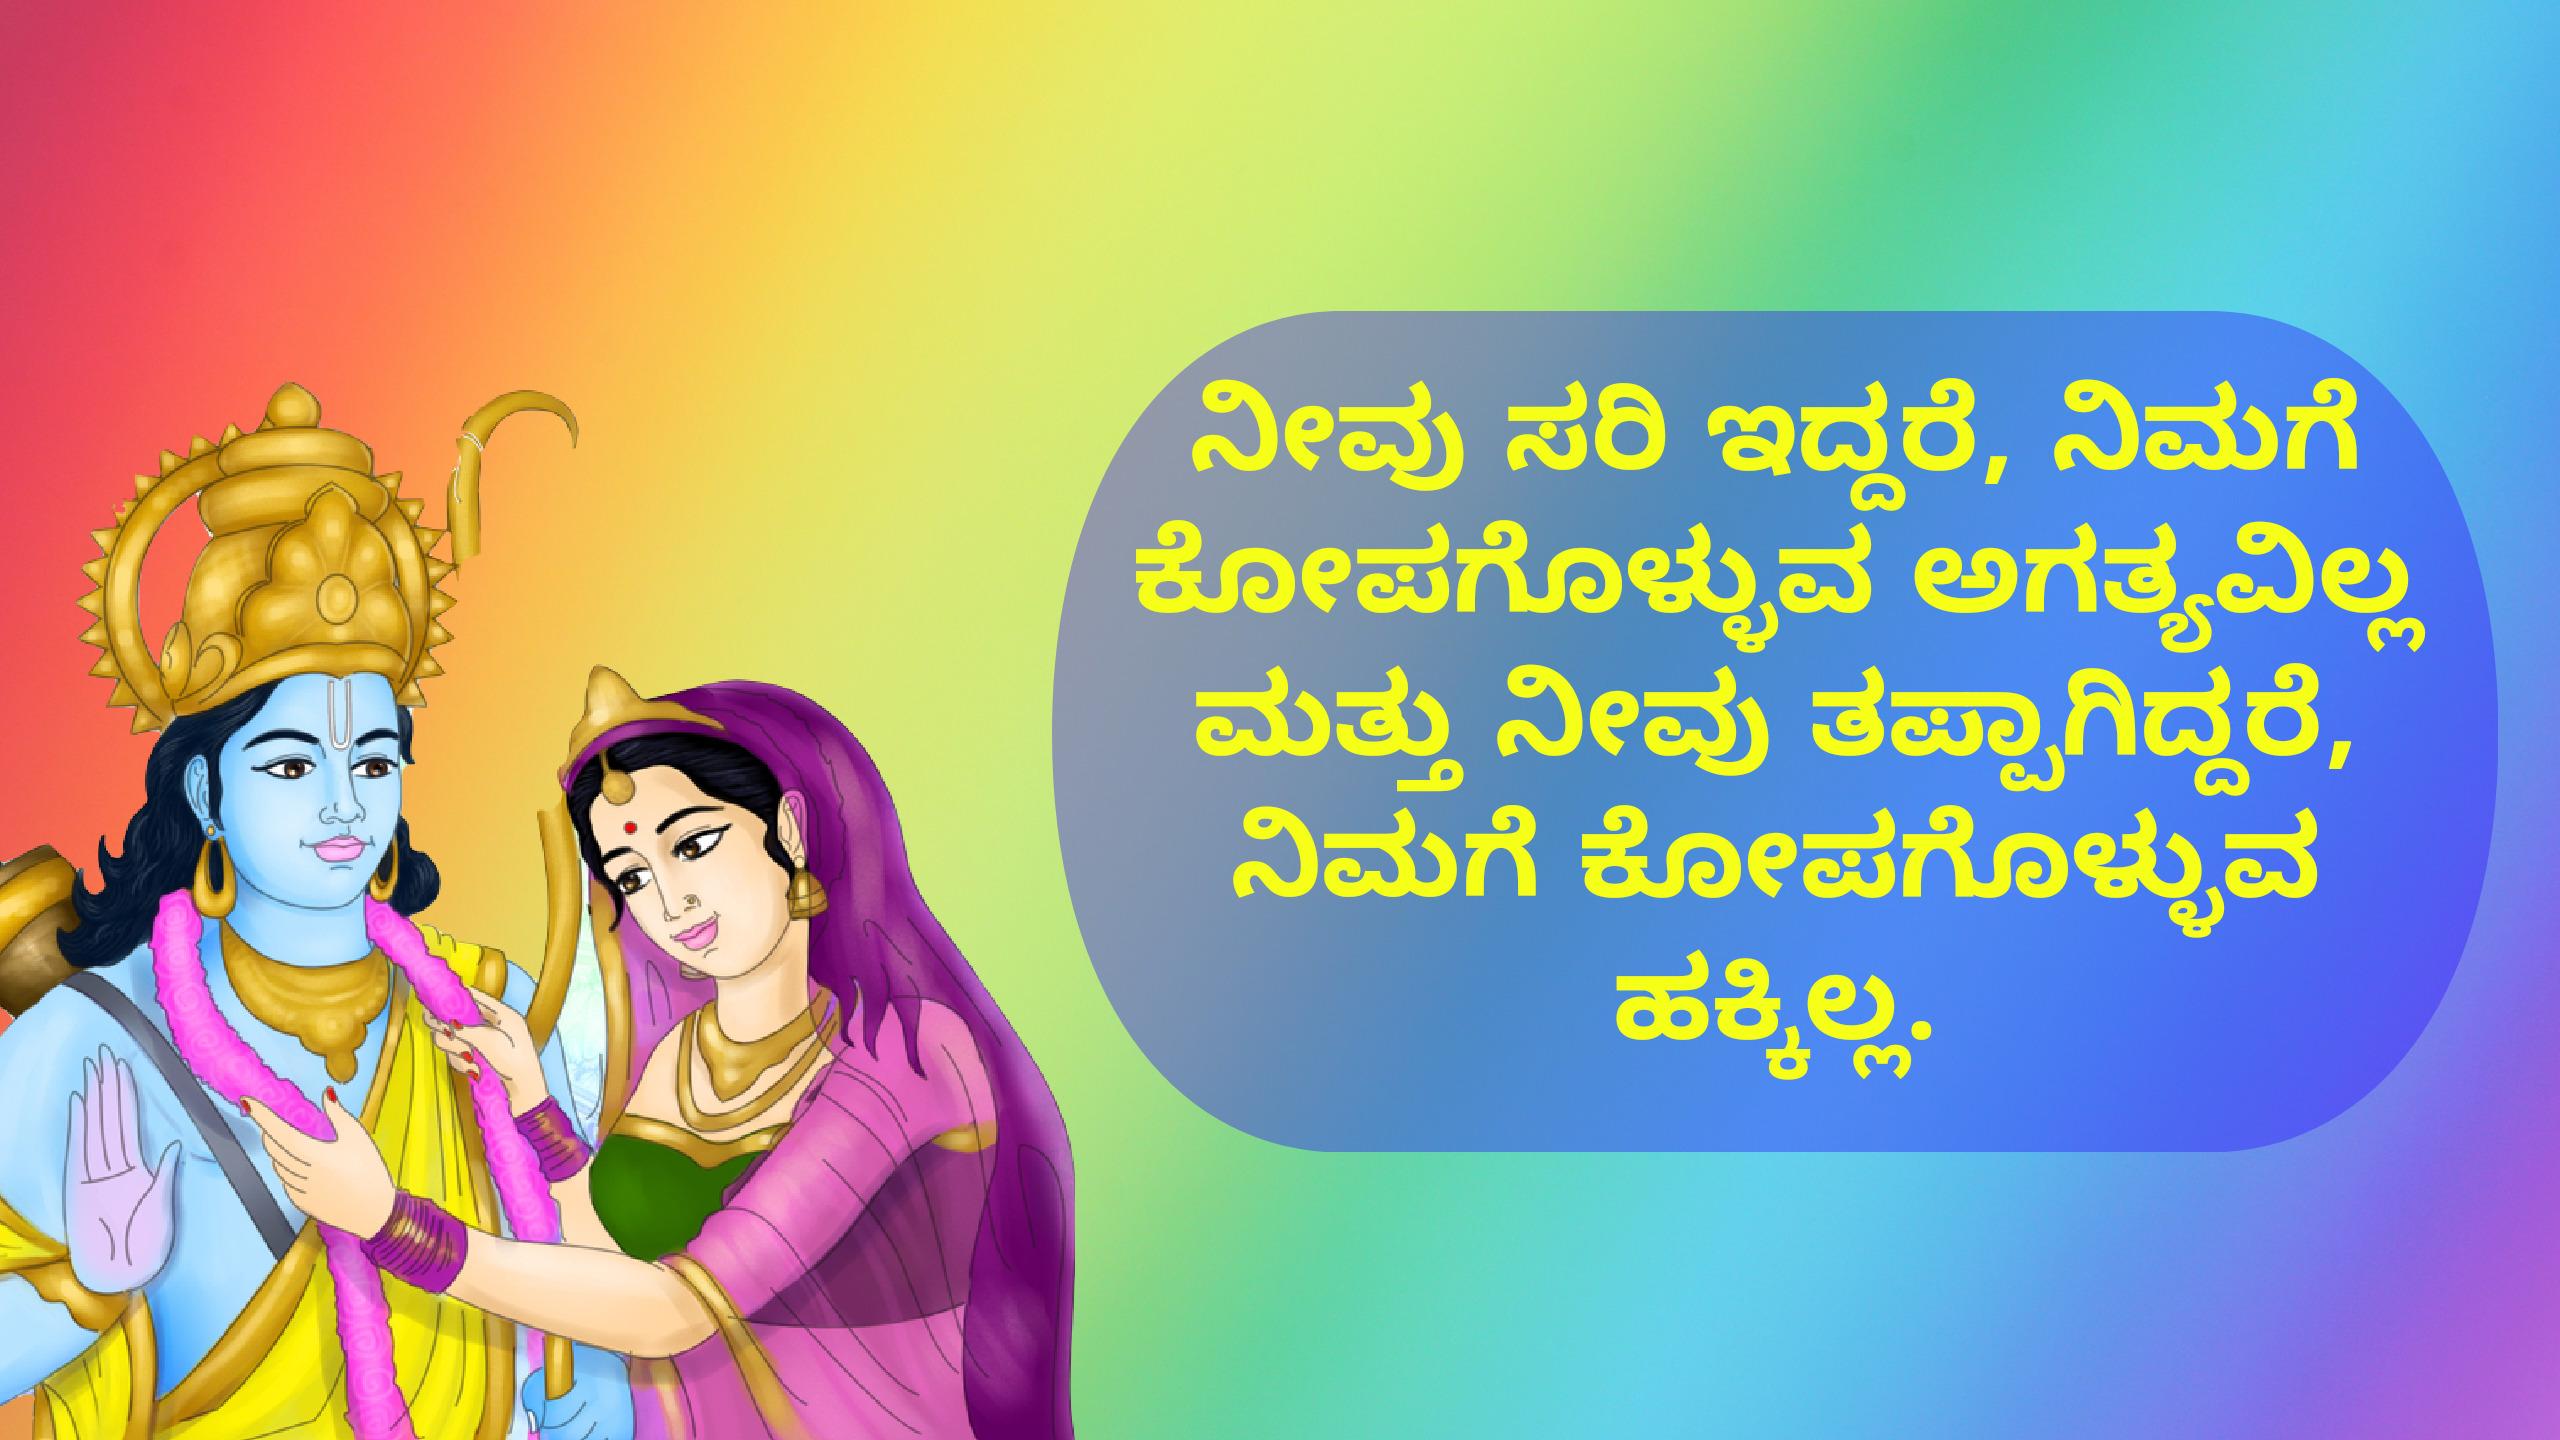 2. Shree Ram Quotes in Kannada